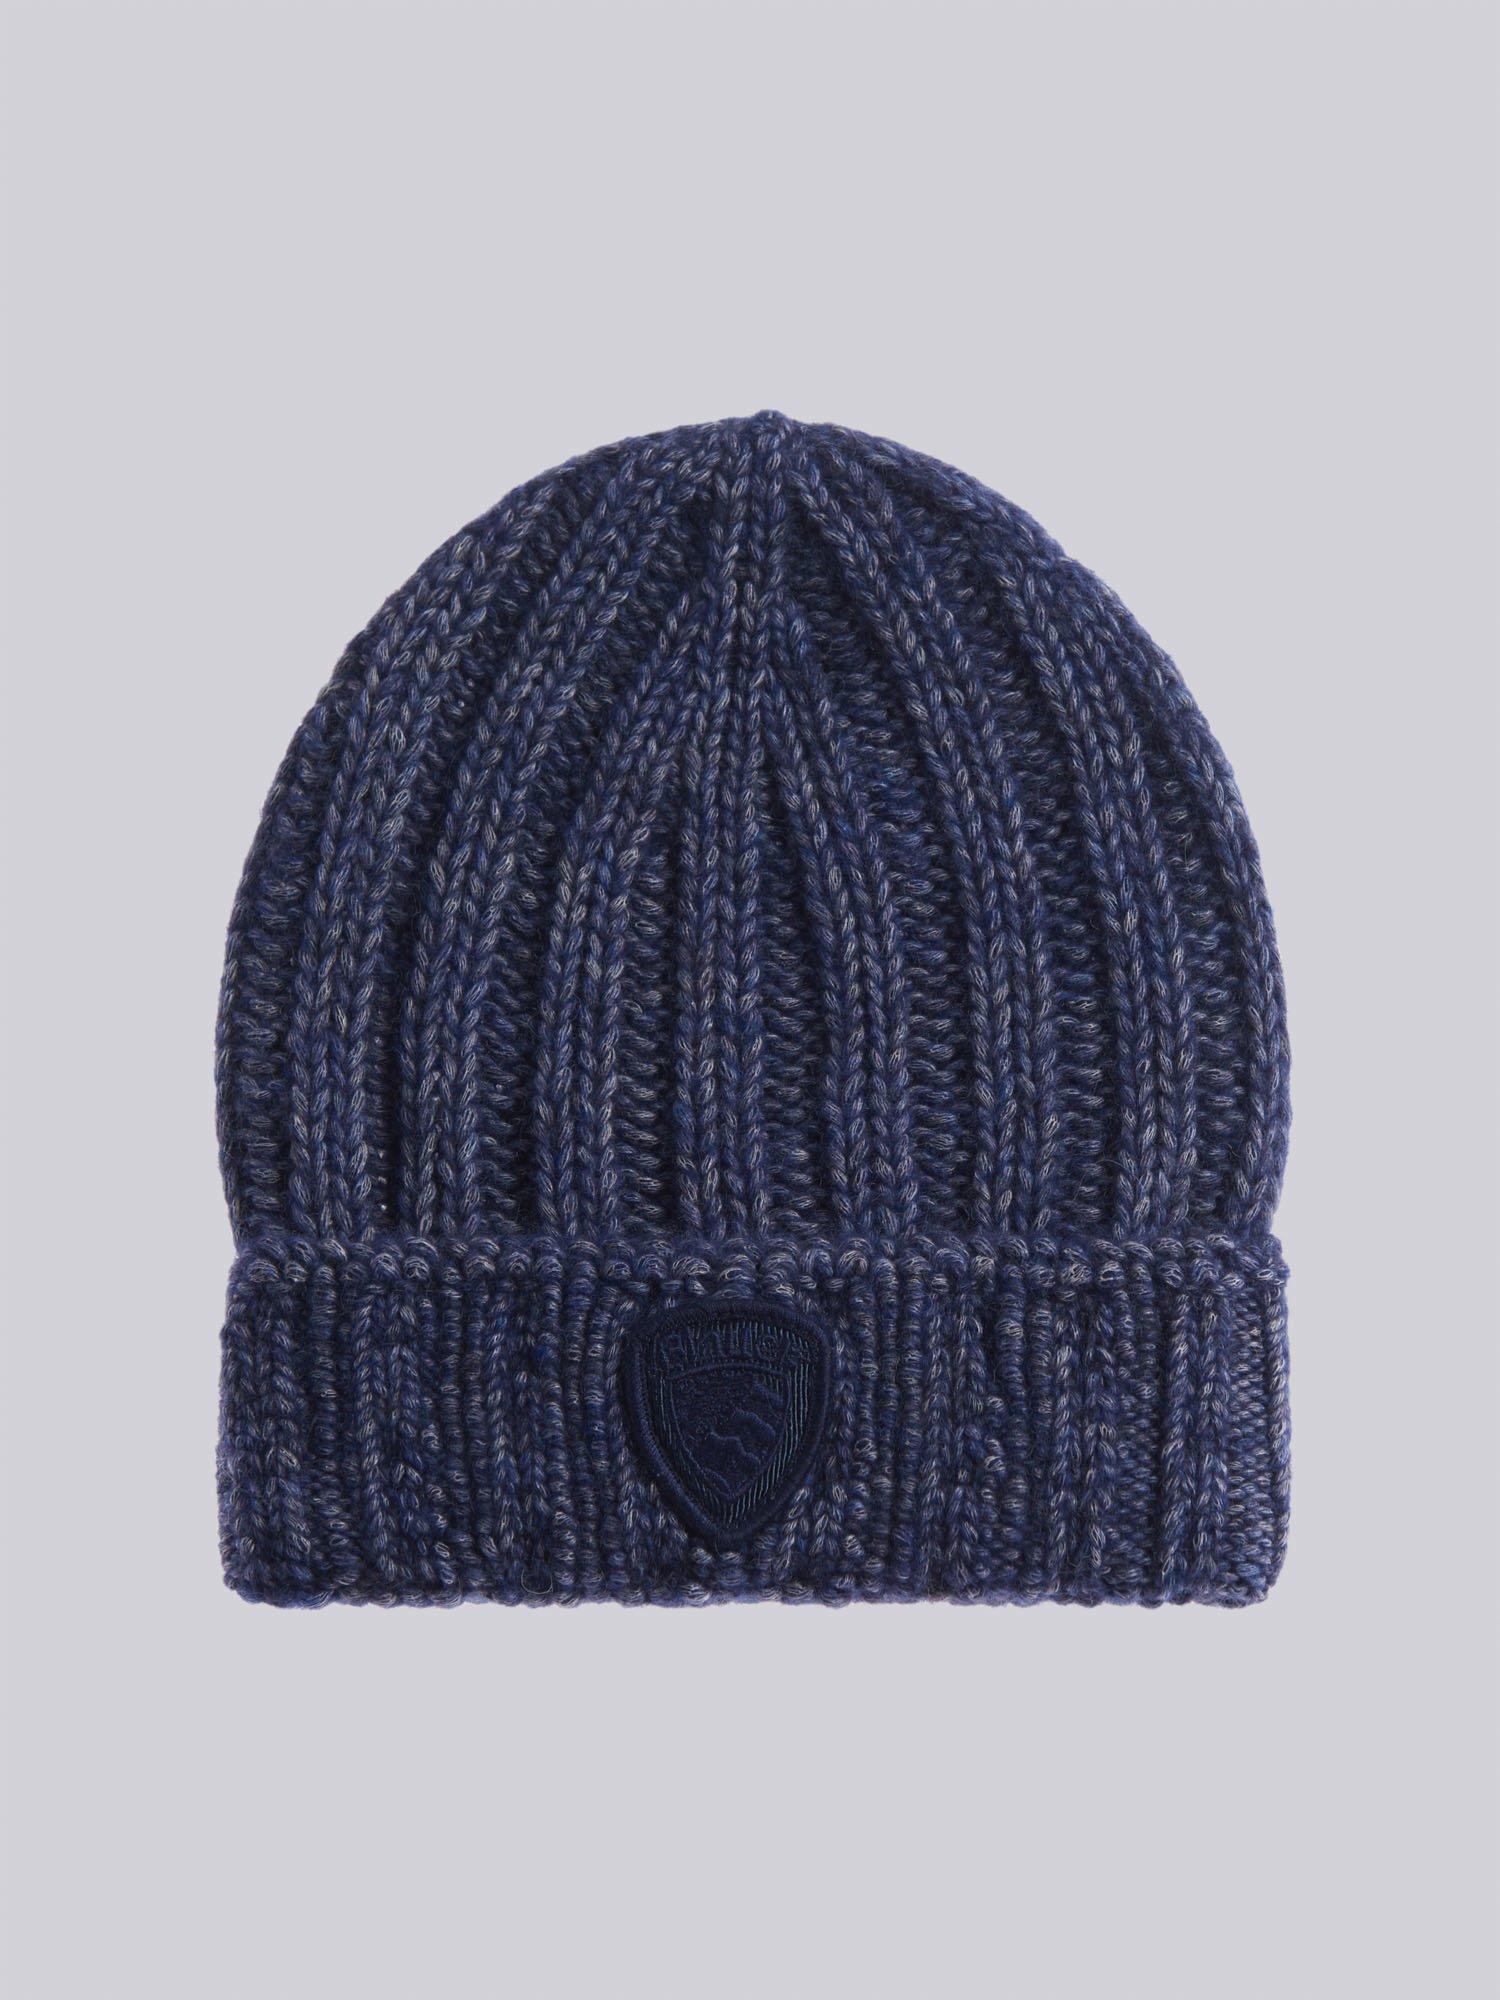 MOULINE CAP - Blauer